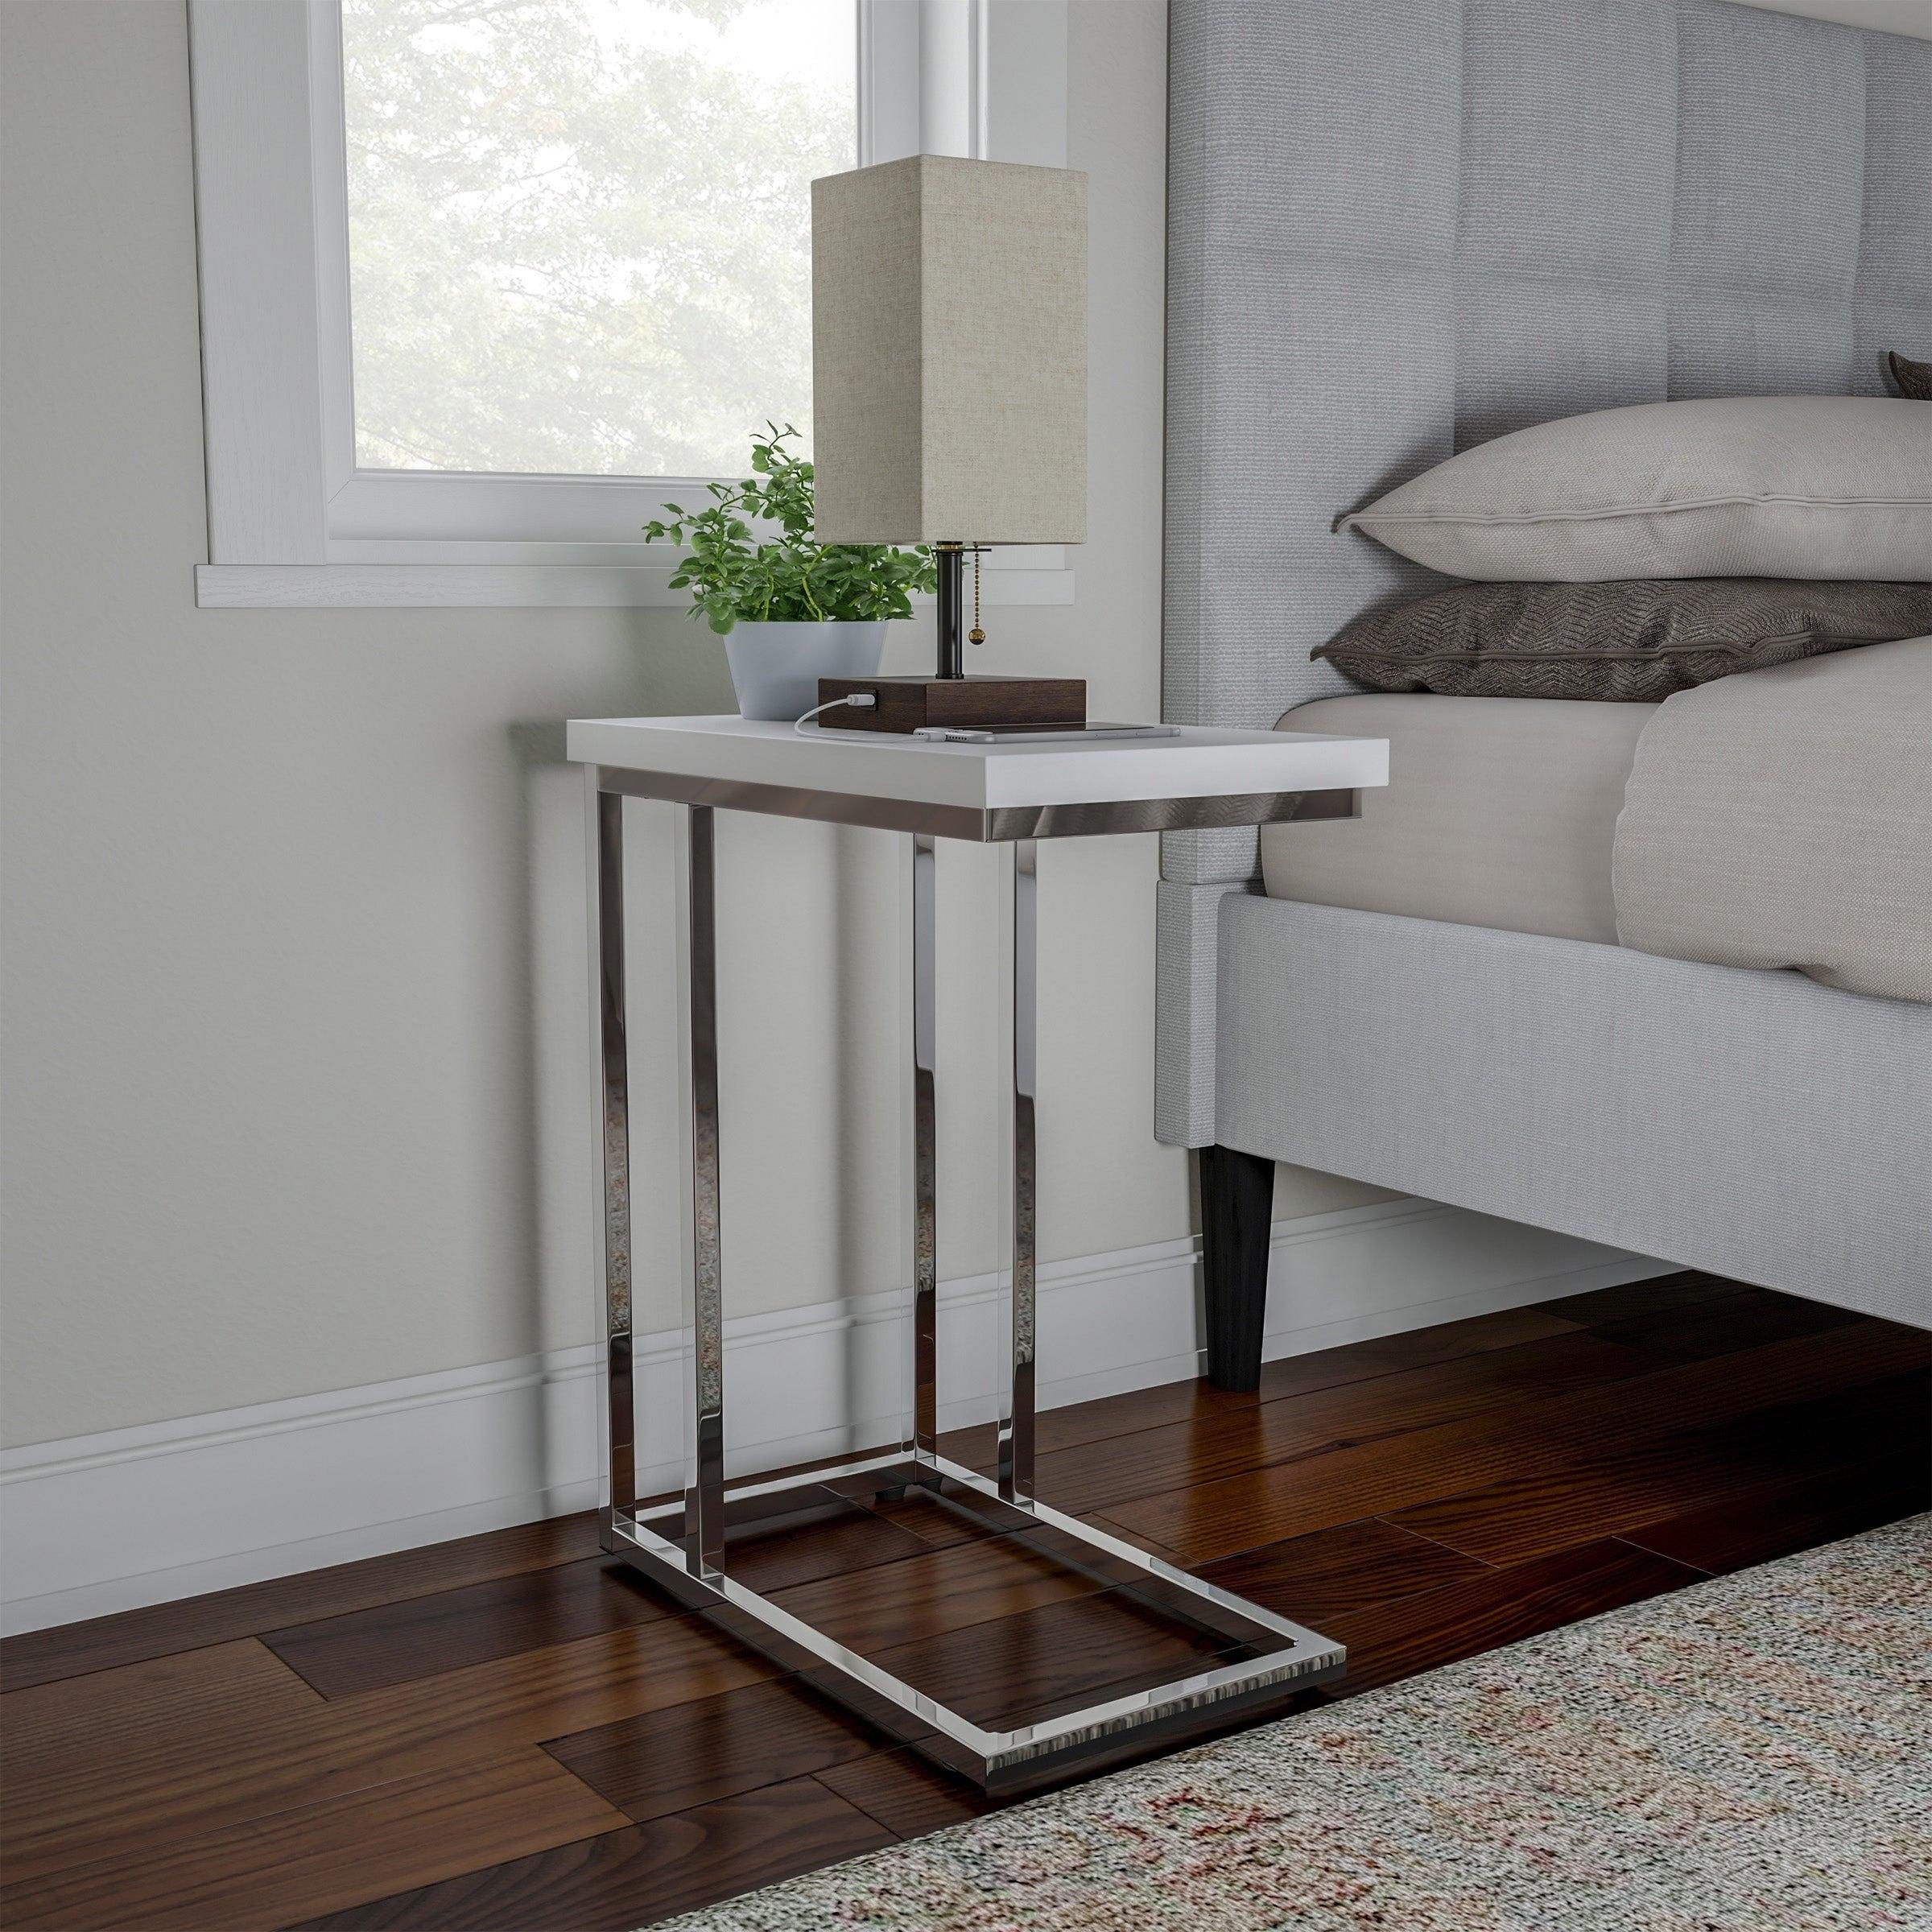 Sofa Side Table C Shaped